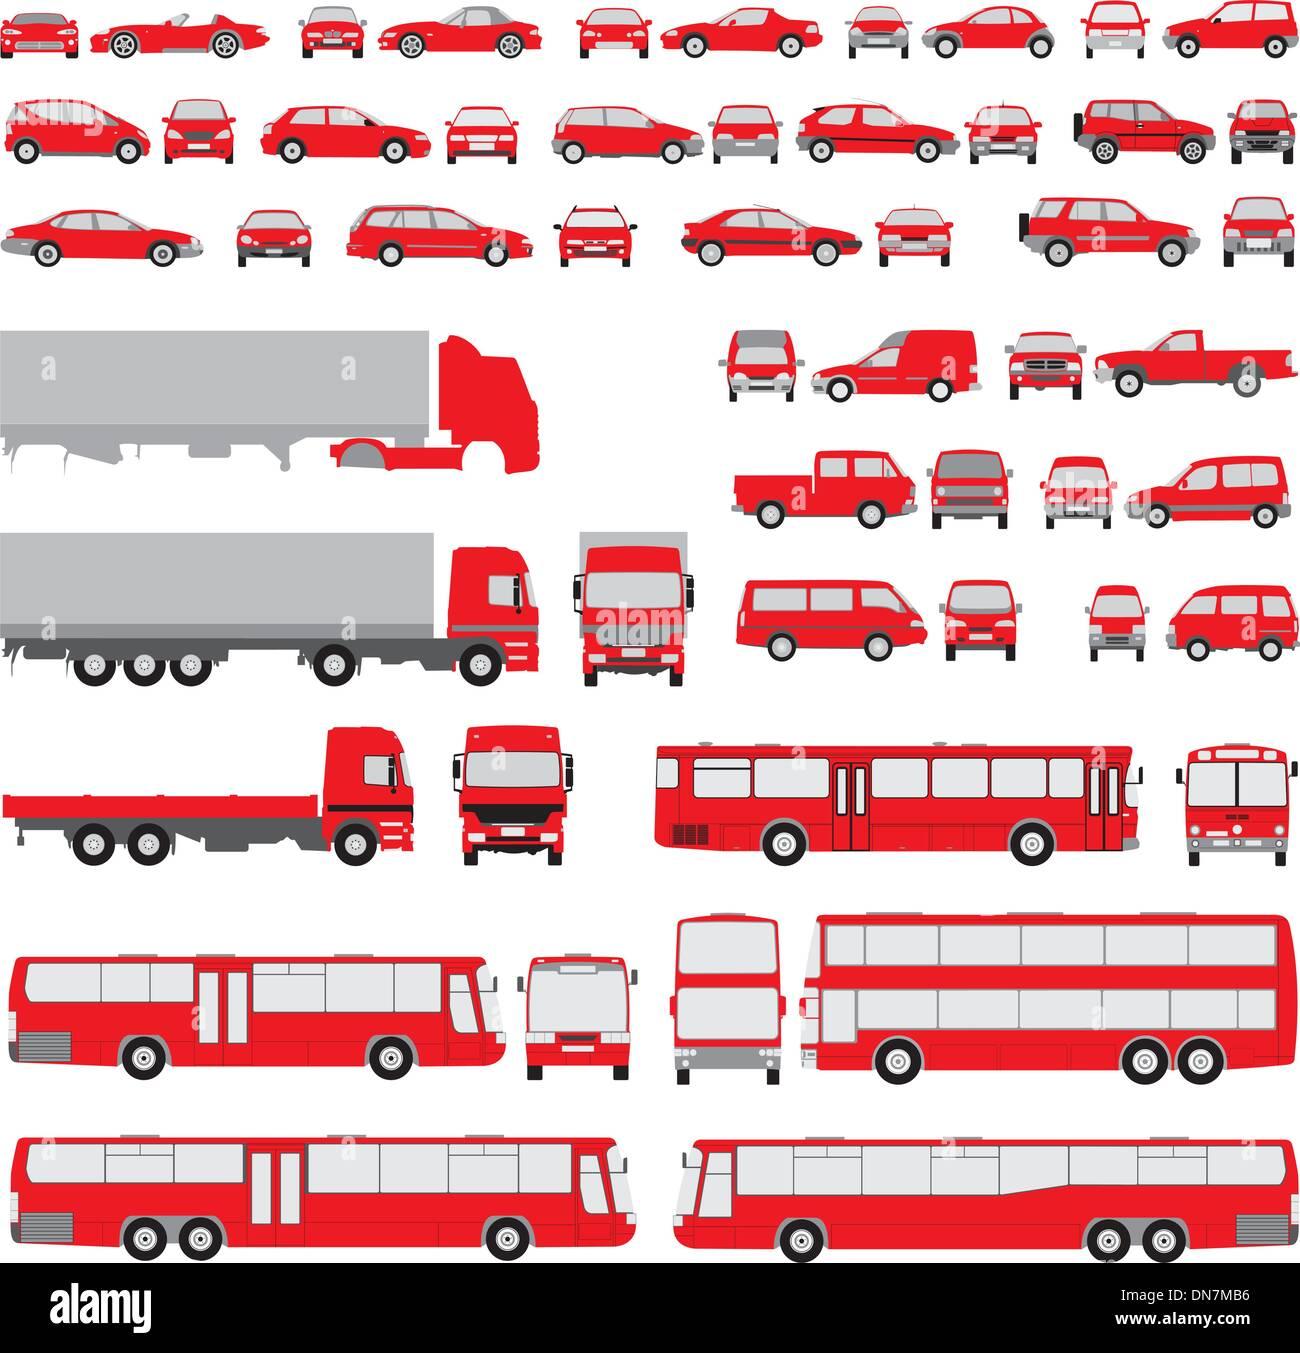 Fahrzeug-sortierte Silhouetten Stockbild